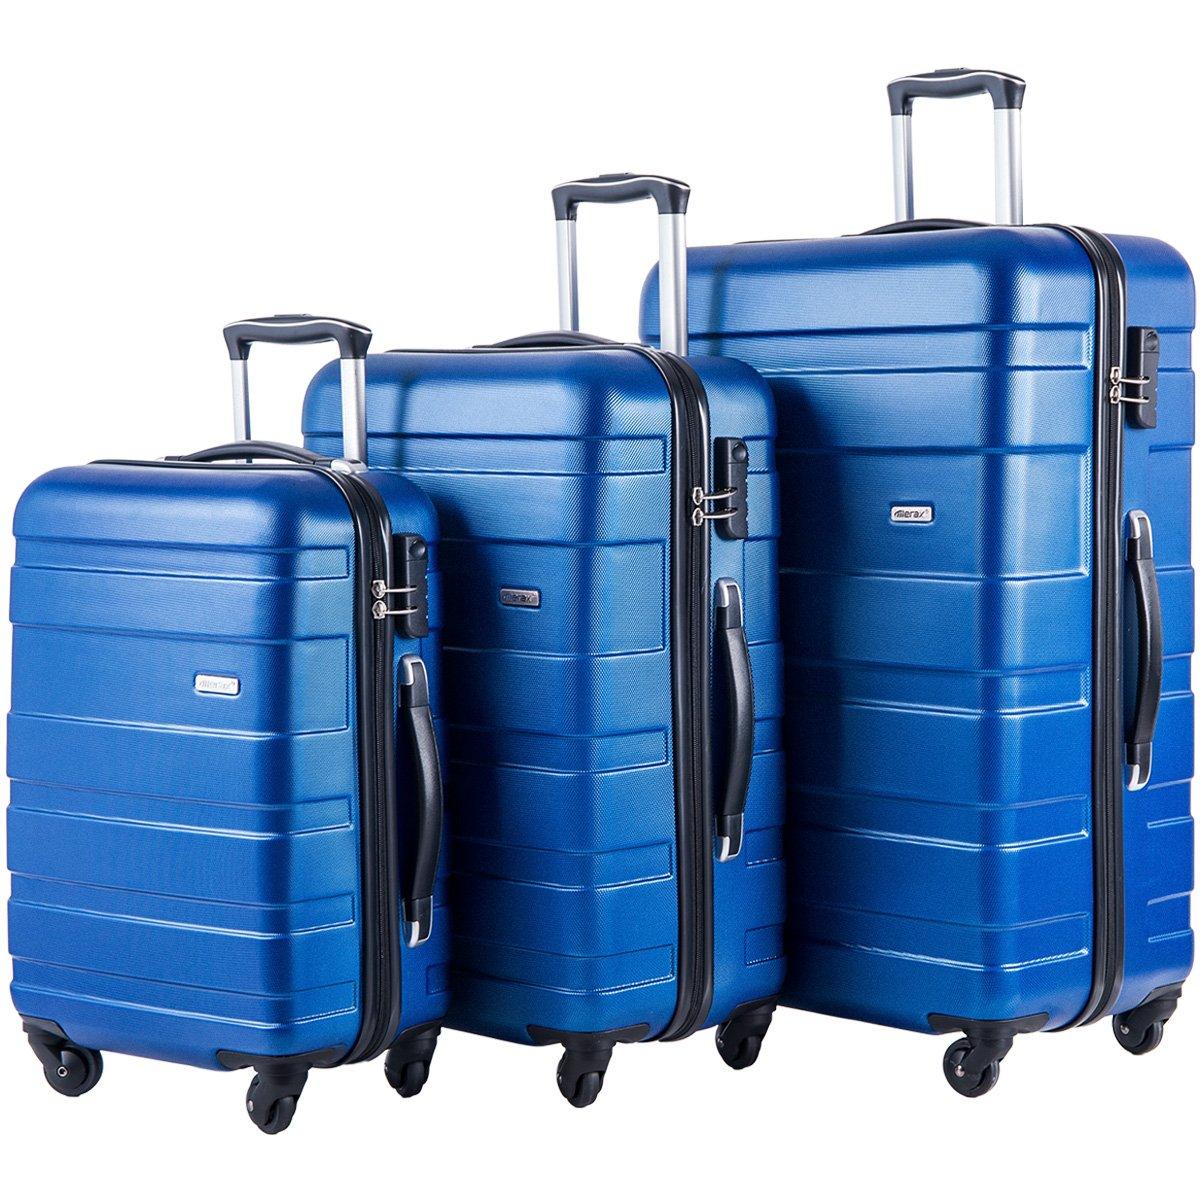 Merax MT Imagine TSA Luggage Set 3 Piece Spinner Suitcase (Blue) by Merax